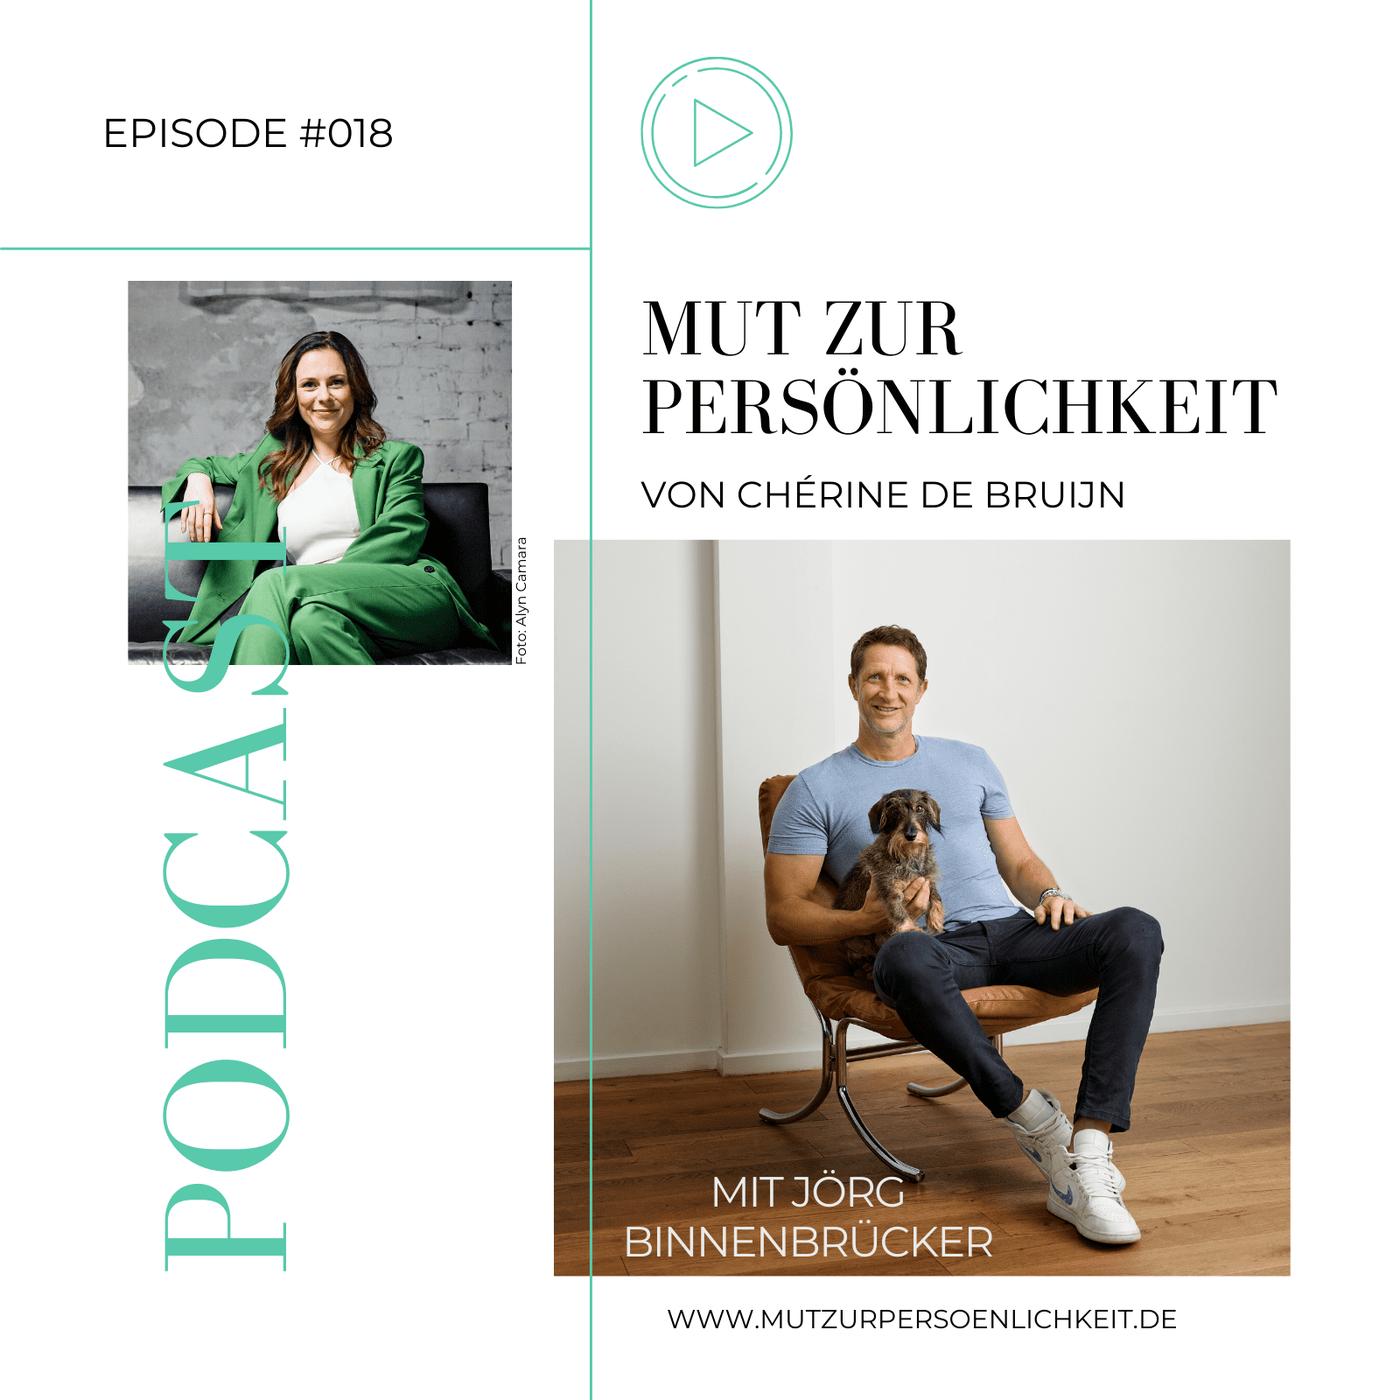 #018: Im Talk mit Jörg Binnenbrücker